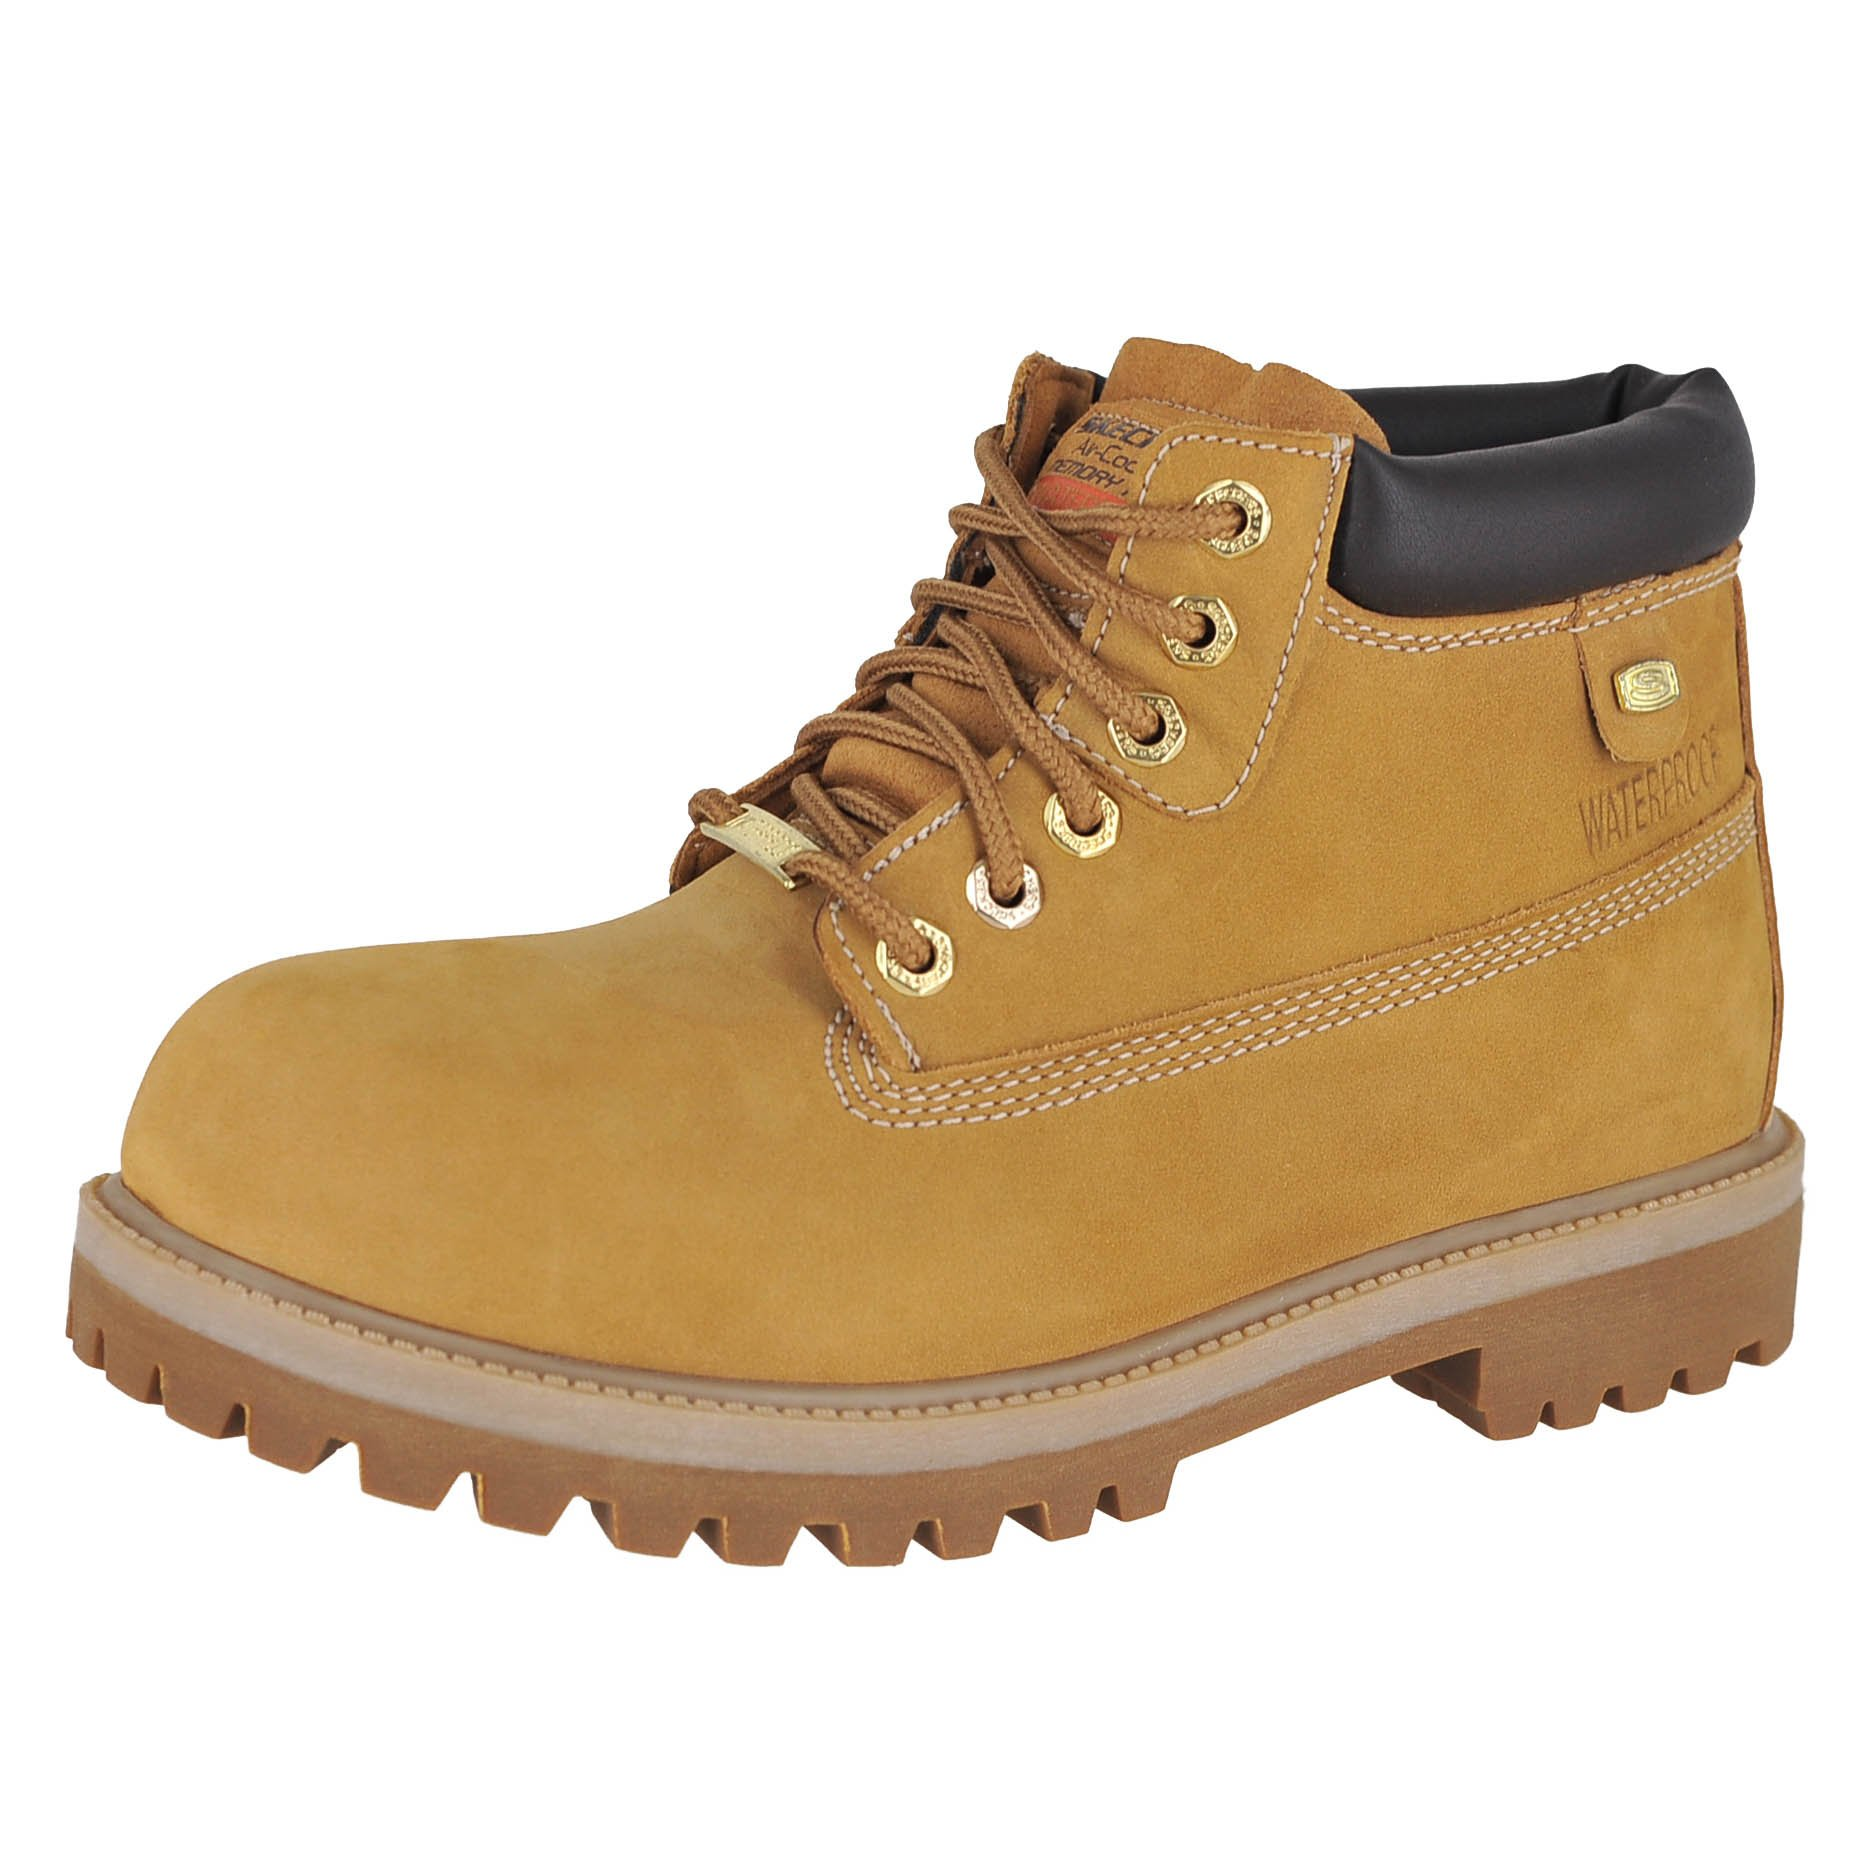 Skechers Mens Sergeants - Verdict Rain Boot, Wheat, Size 10.5